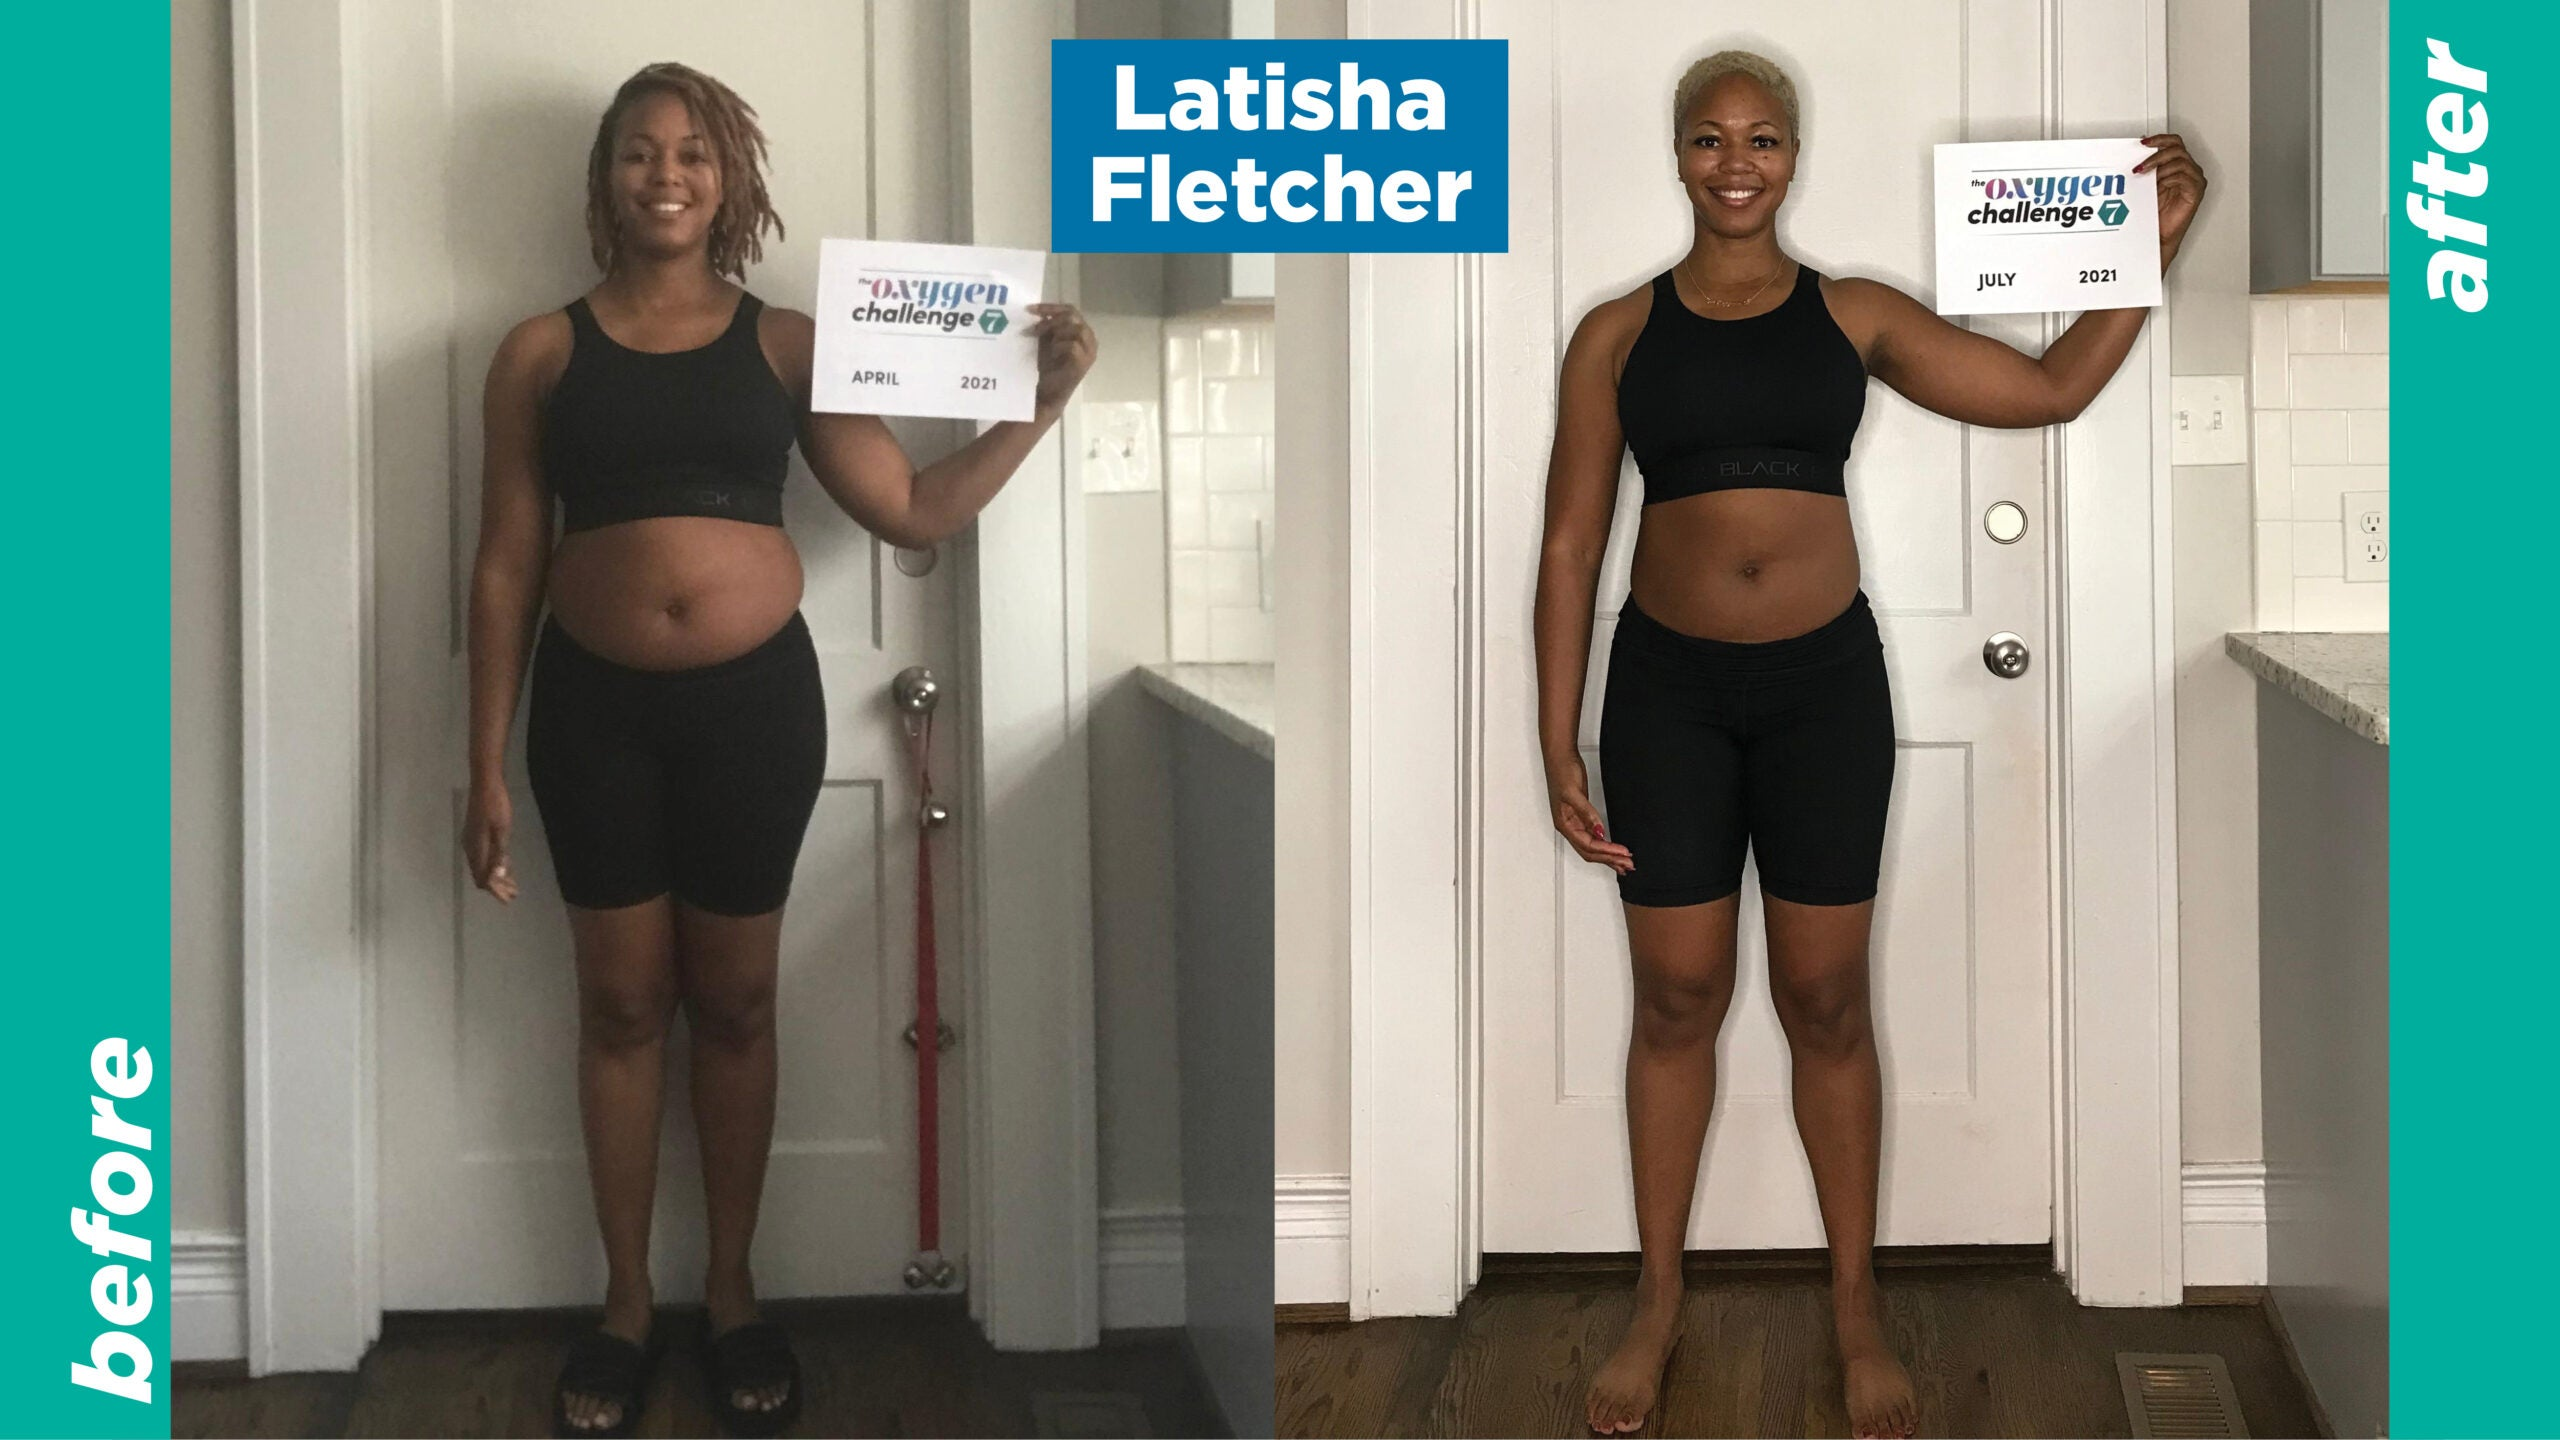 Latisha Fletcher